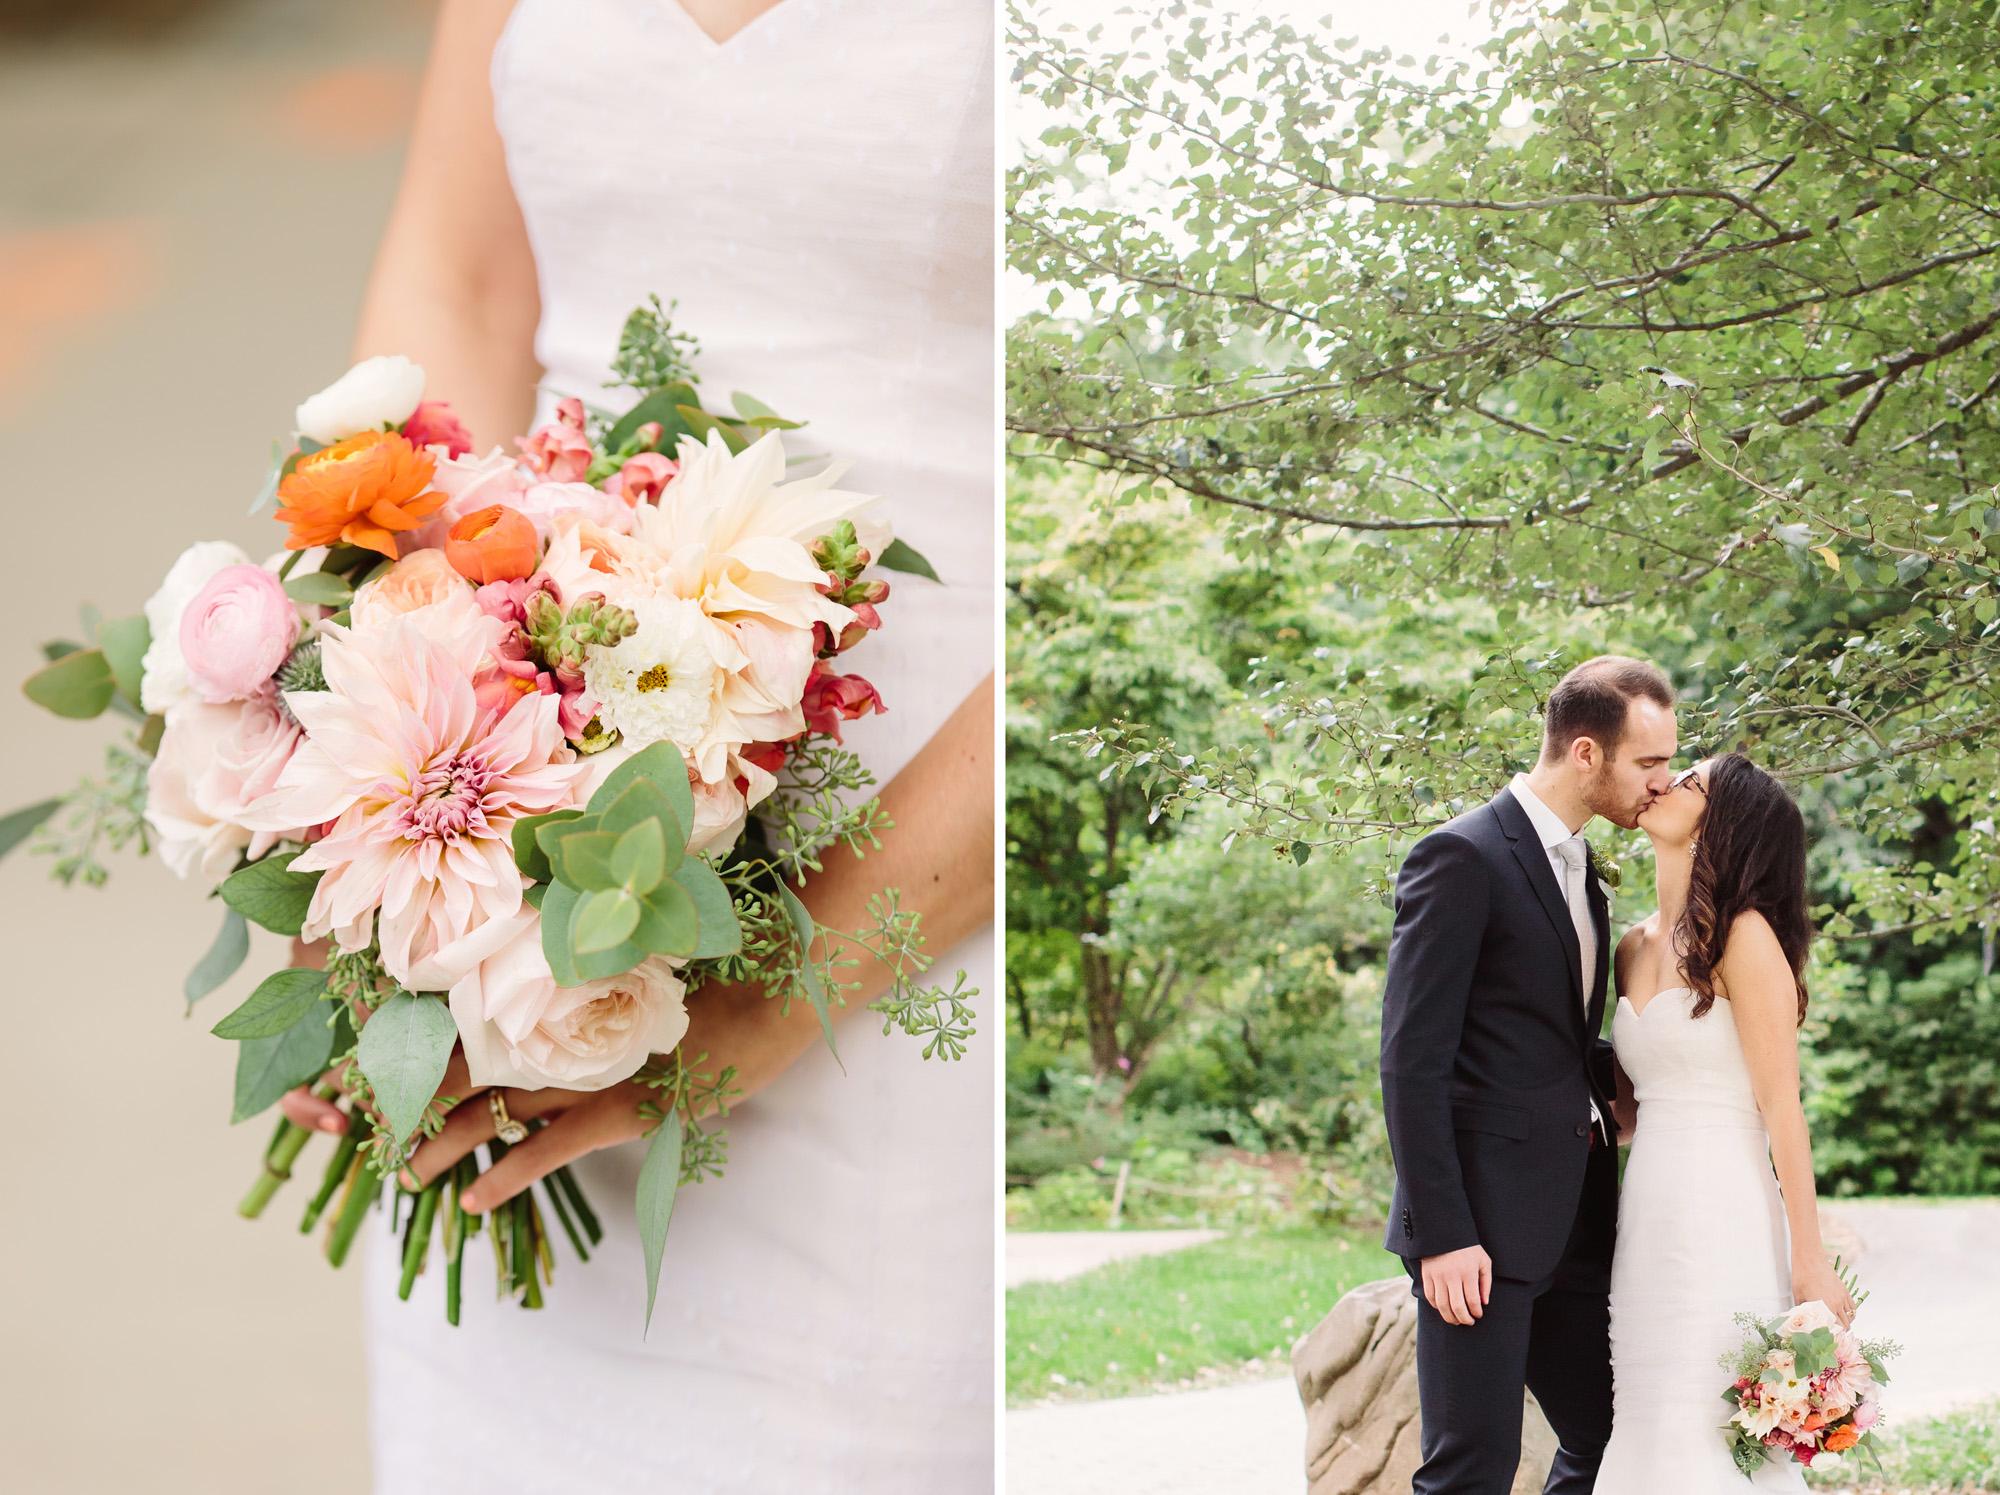 29_Kate_Sam_Picnic_House_Wedding_Brooklyn_NY_Tanya_Salazar_Photography.jpg